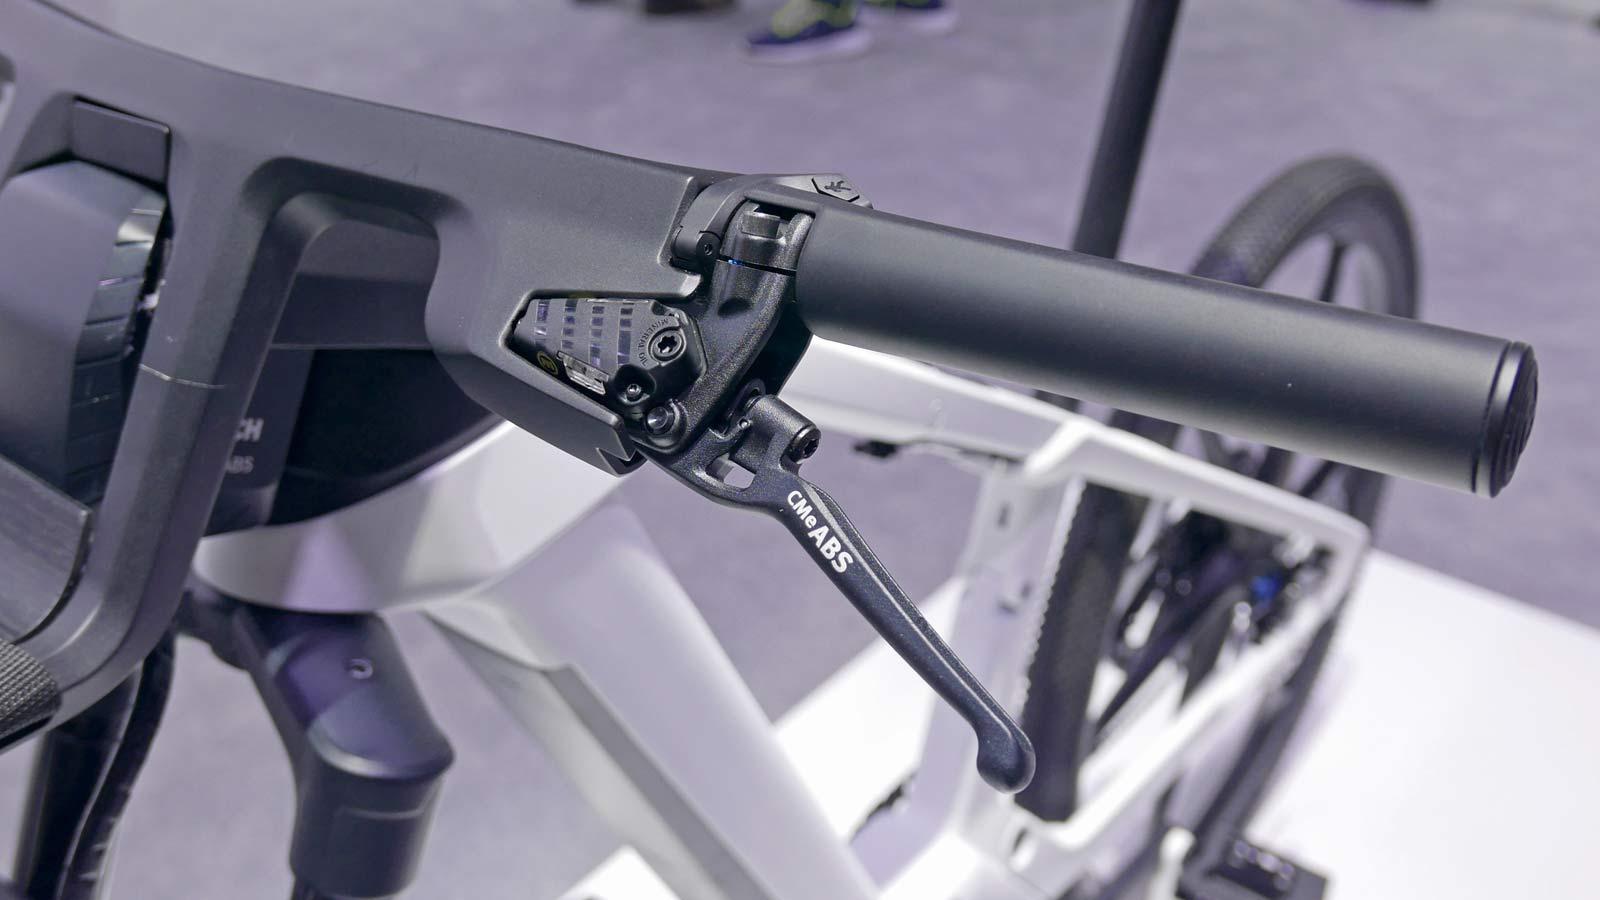 Bosch eBike ABS prototype e-bike with integrated anti-lock braking, Margura lever